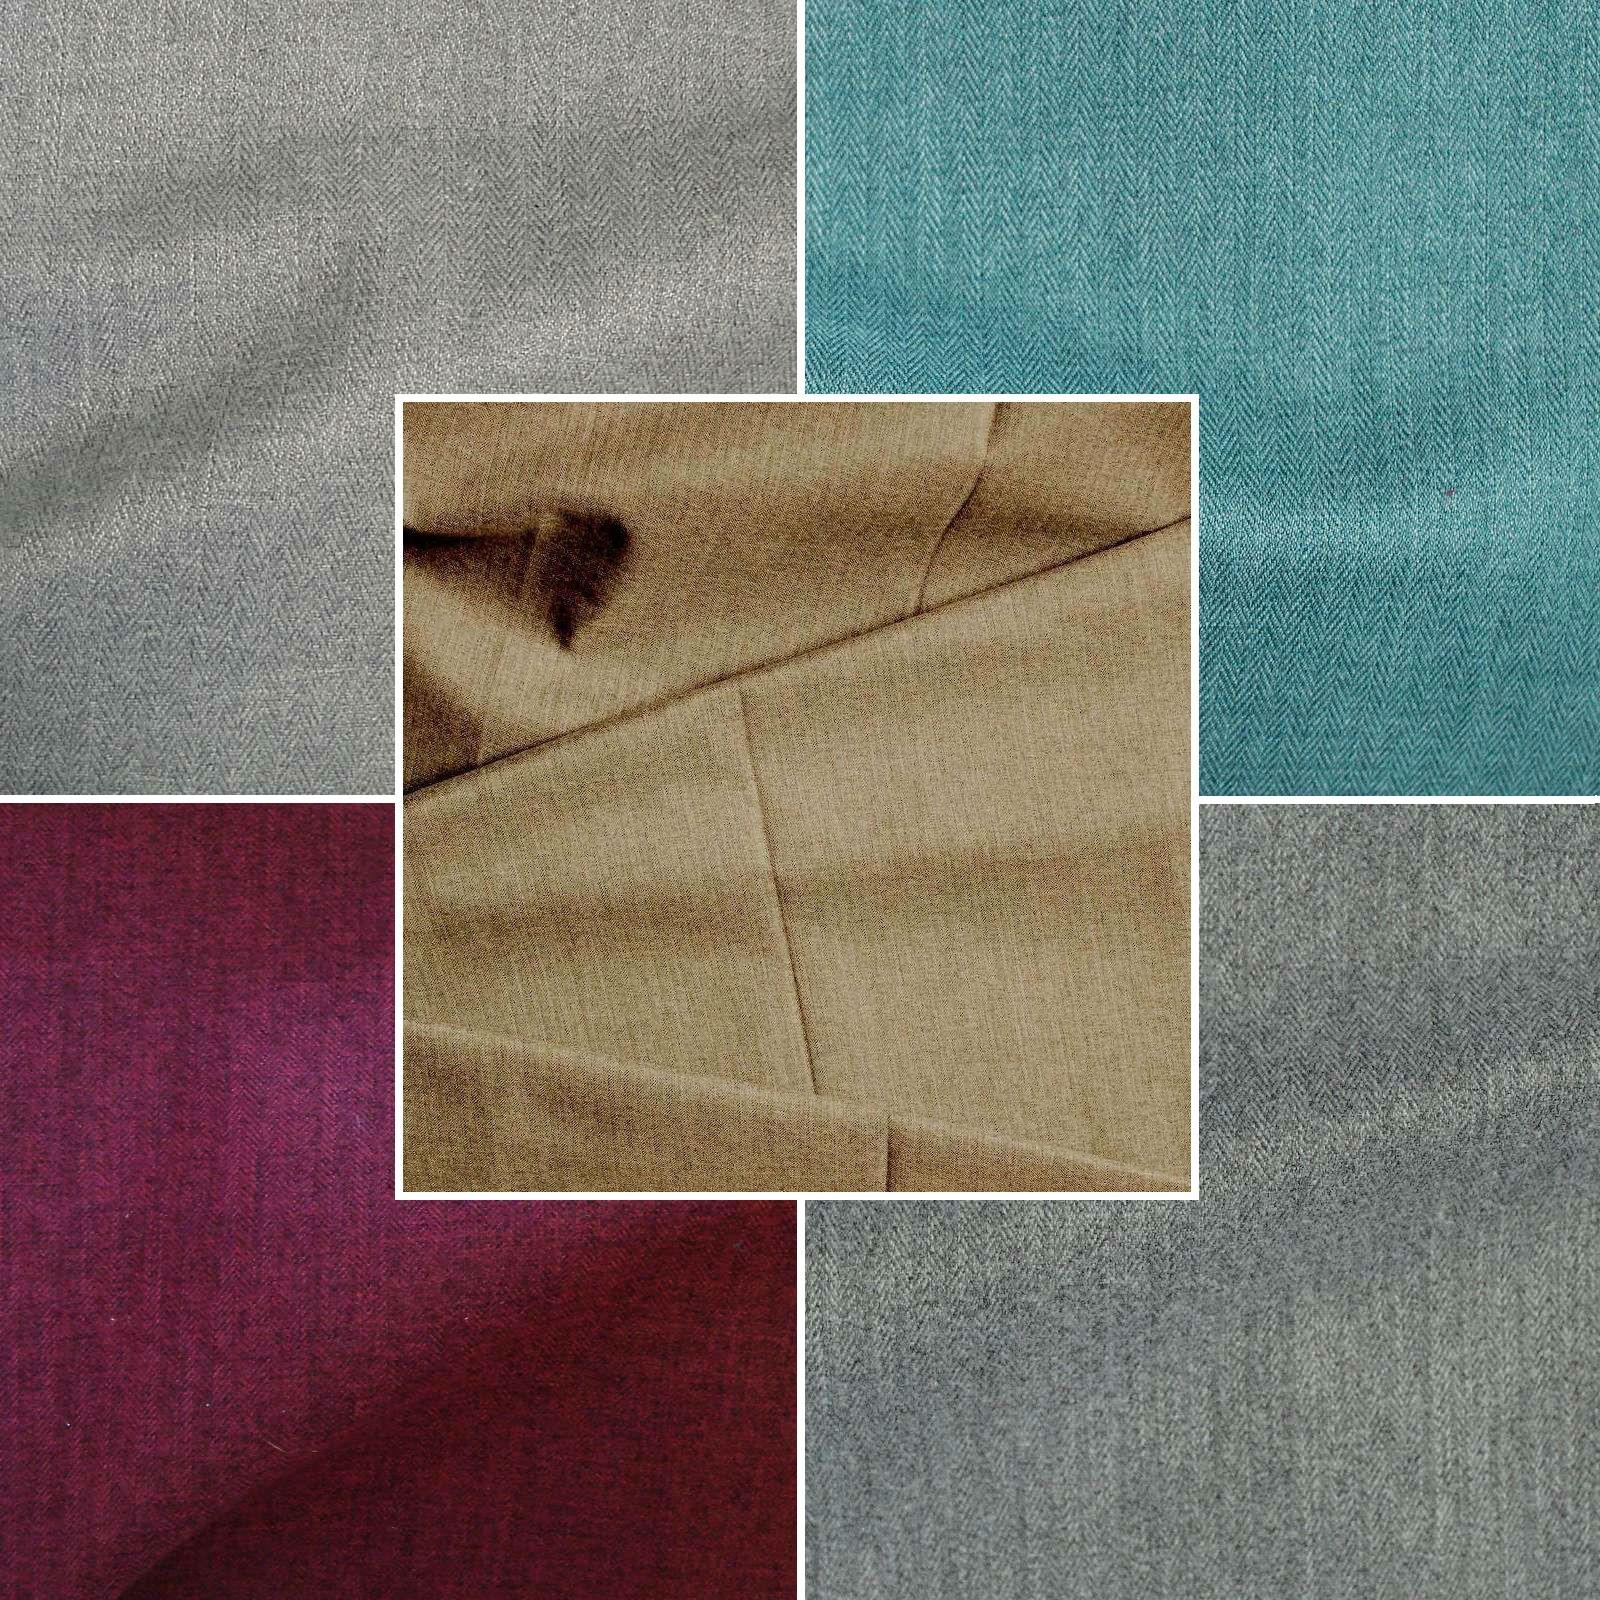 dublin custom drapery eyelets united jacquard curtain. Black Bedroom Furniture Sets. Home Design Ideas